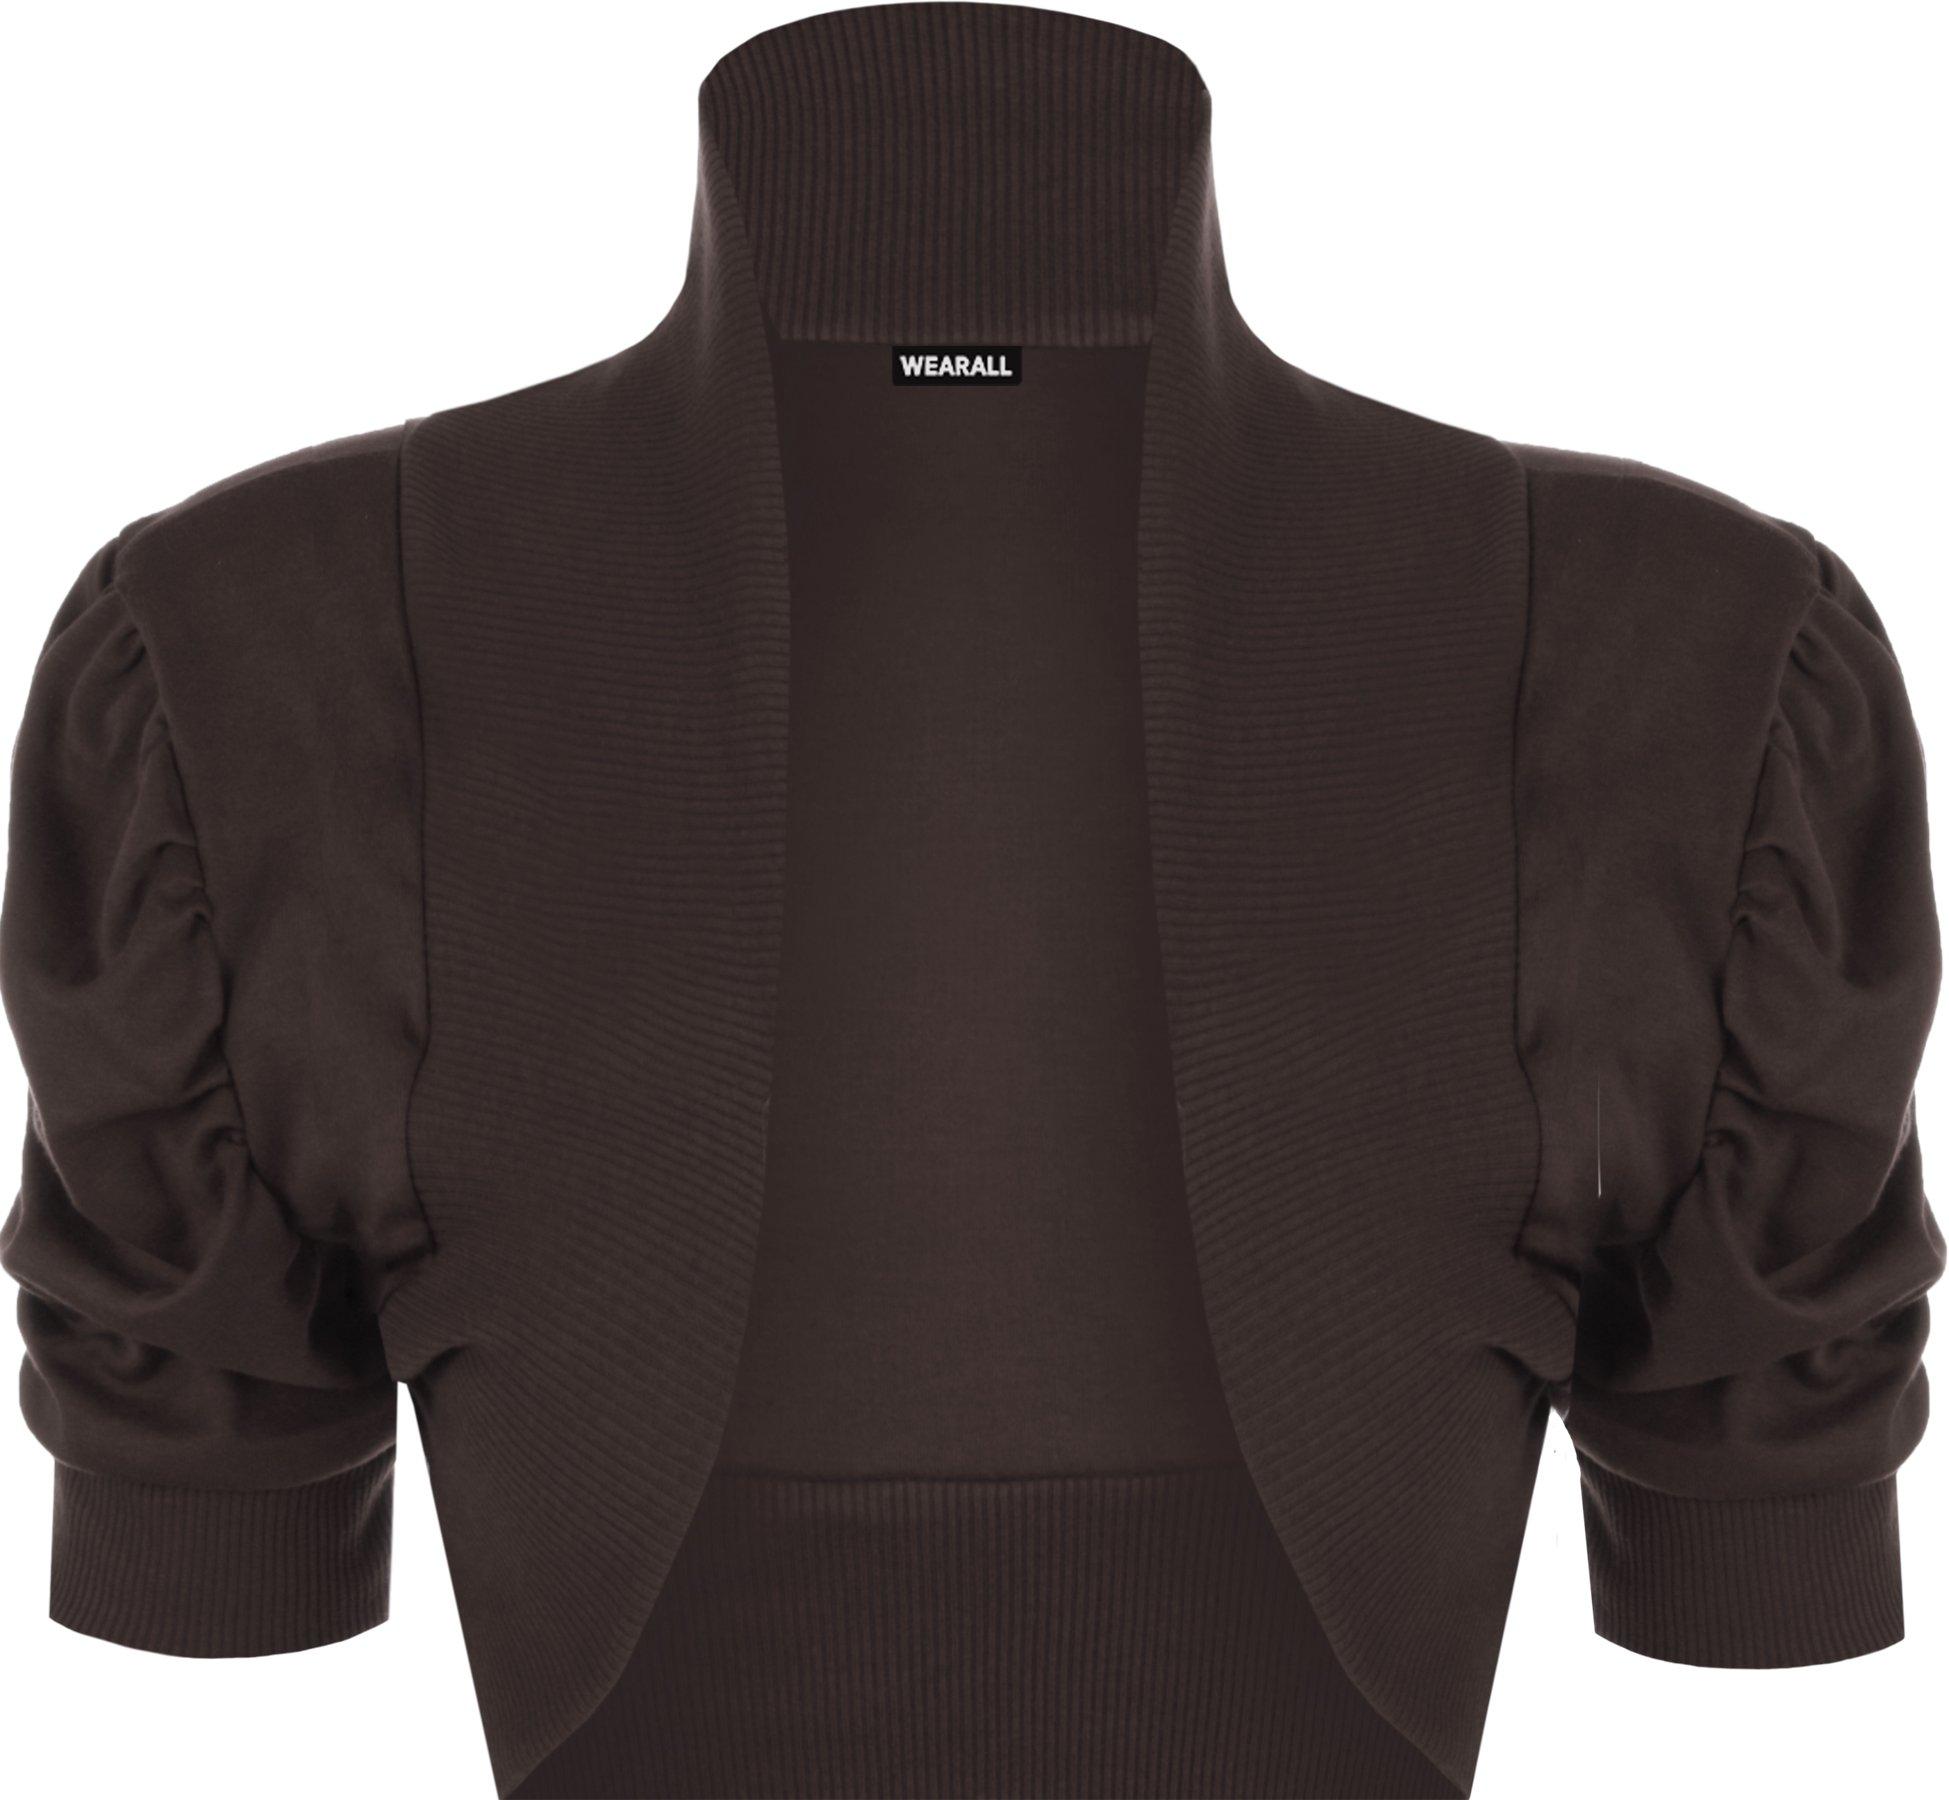 WearAll Women's Ruched Shrug Ladies Bolero Top - Brown - US 16-18 (UK 20-22)